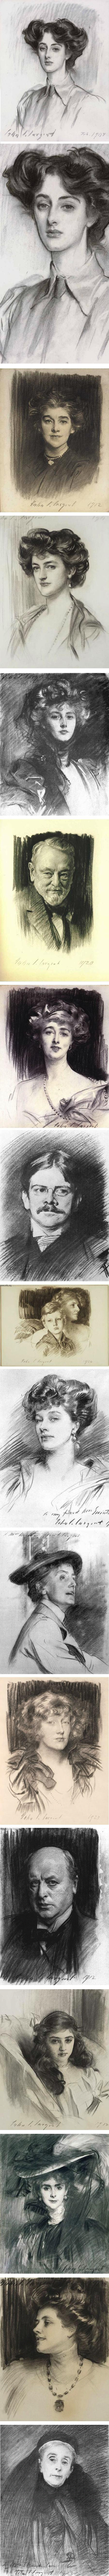 John Singer Sargent portrait drawings